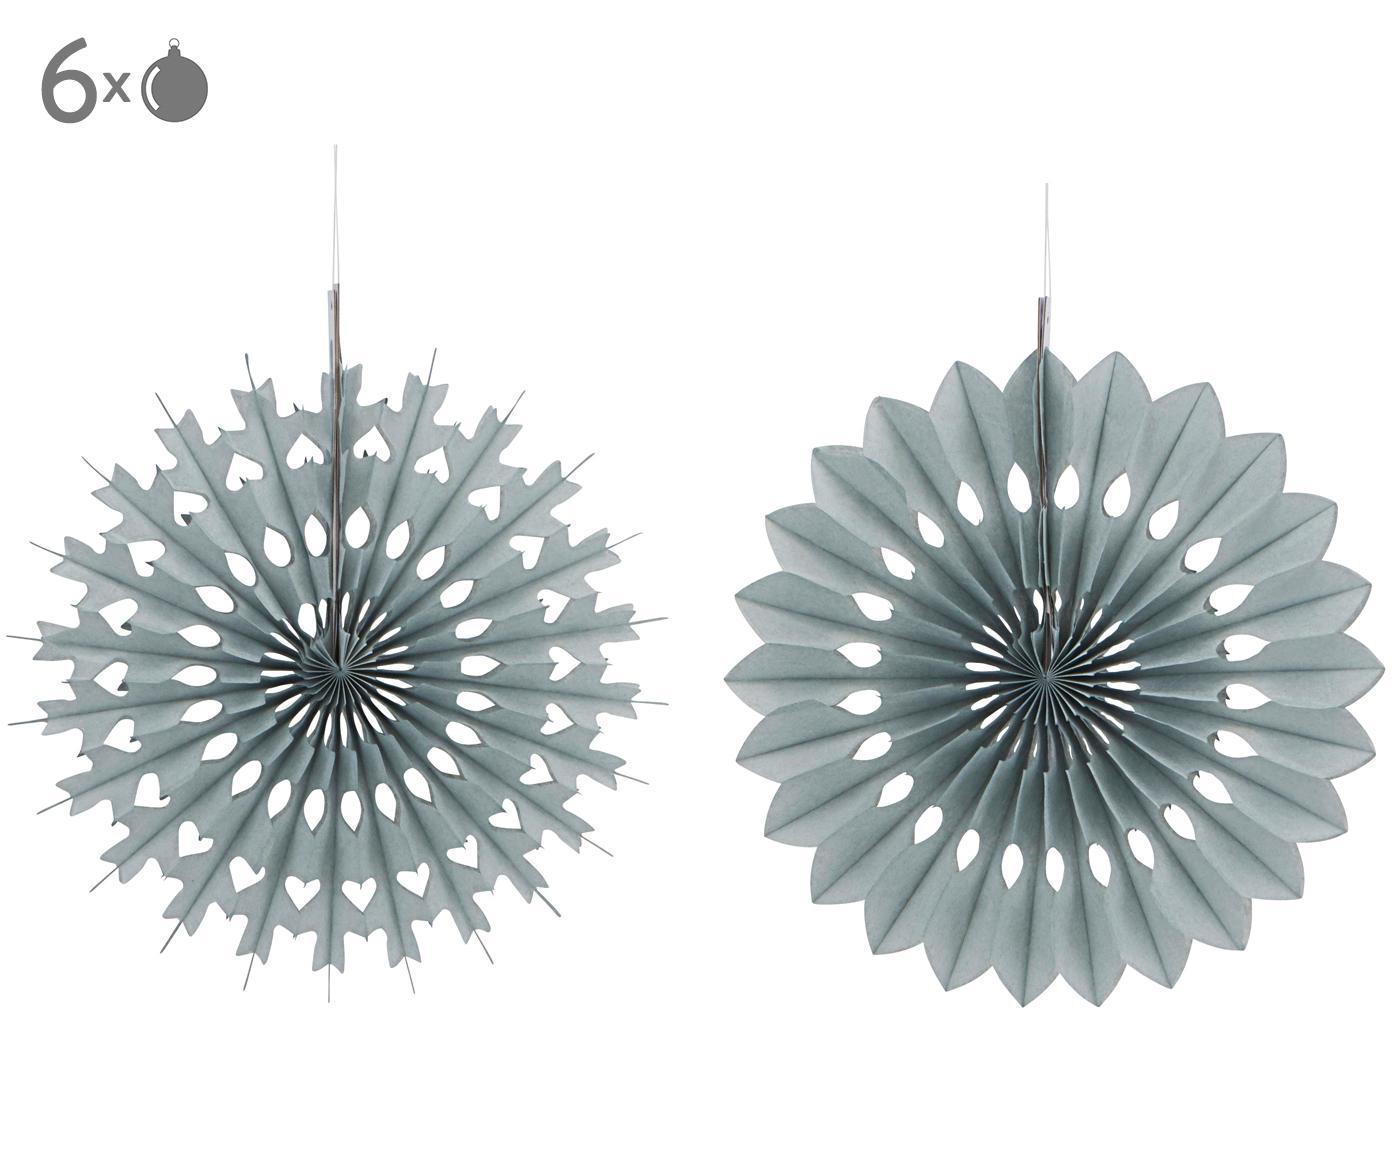 Set de decoraciones colgantes Cut, 6 elem., Papel, Gris, Ø 20 cm